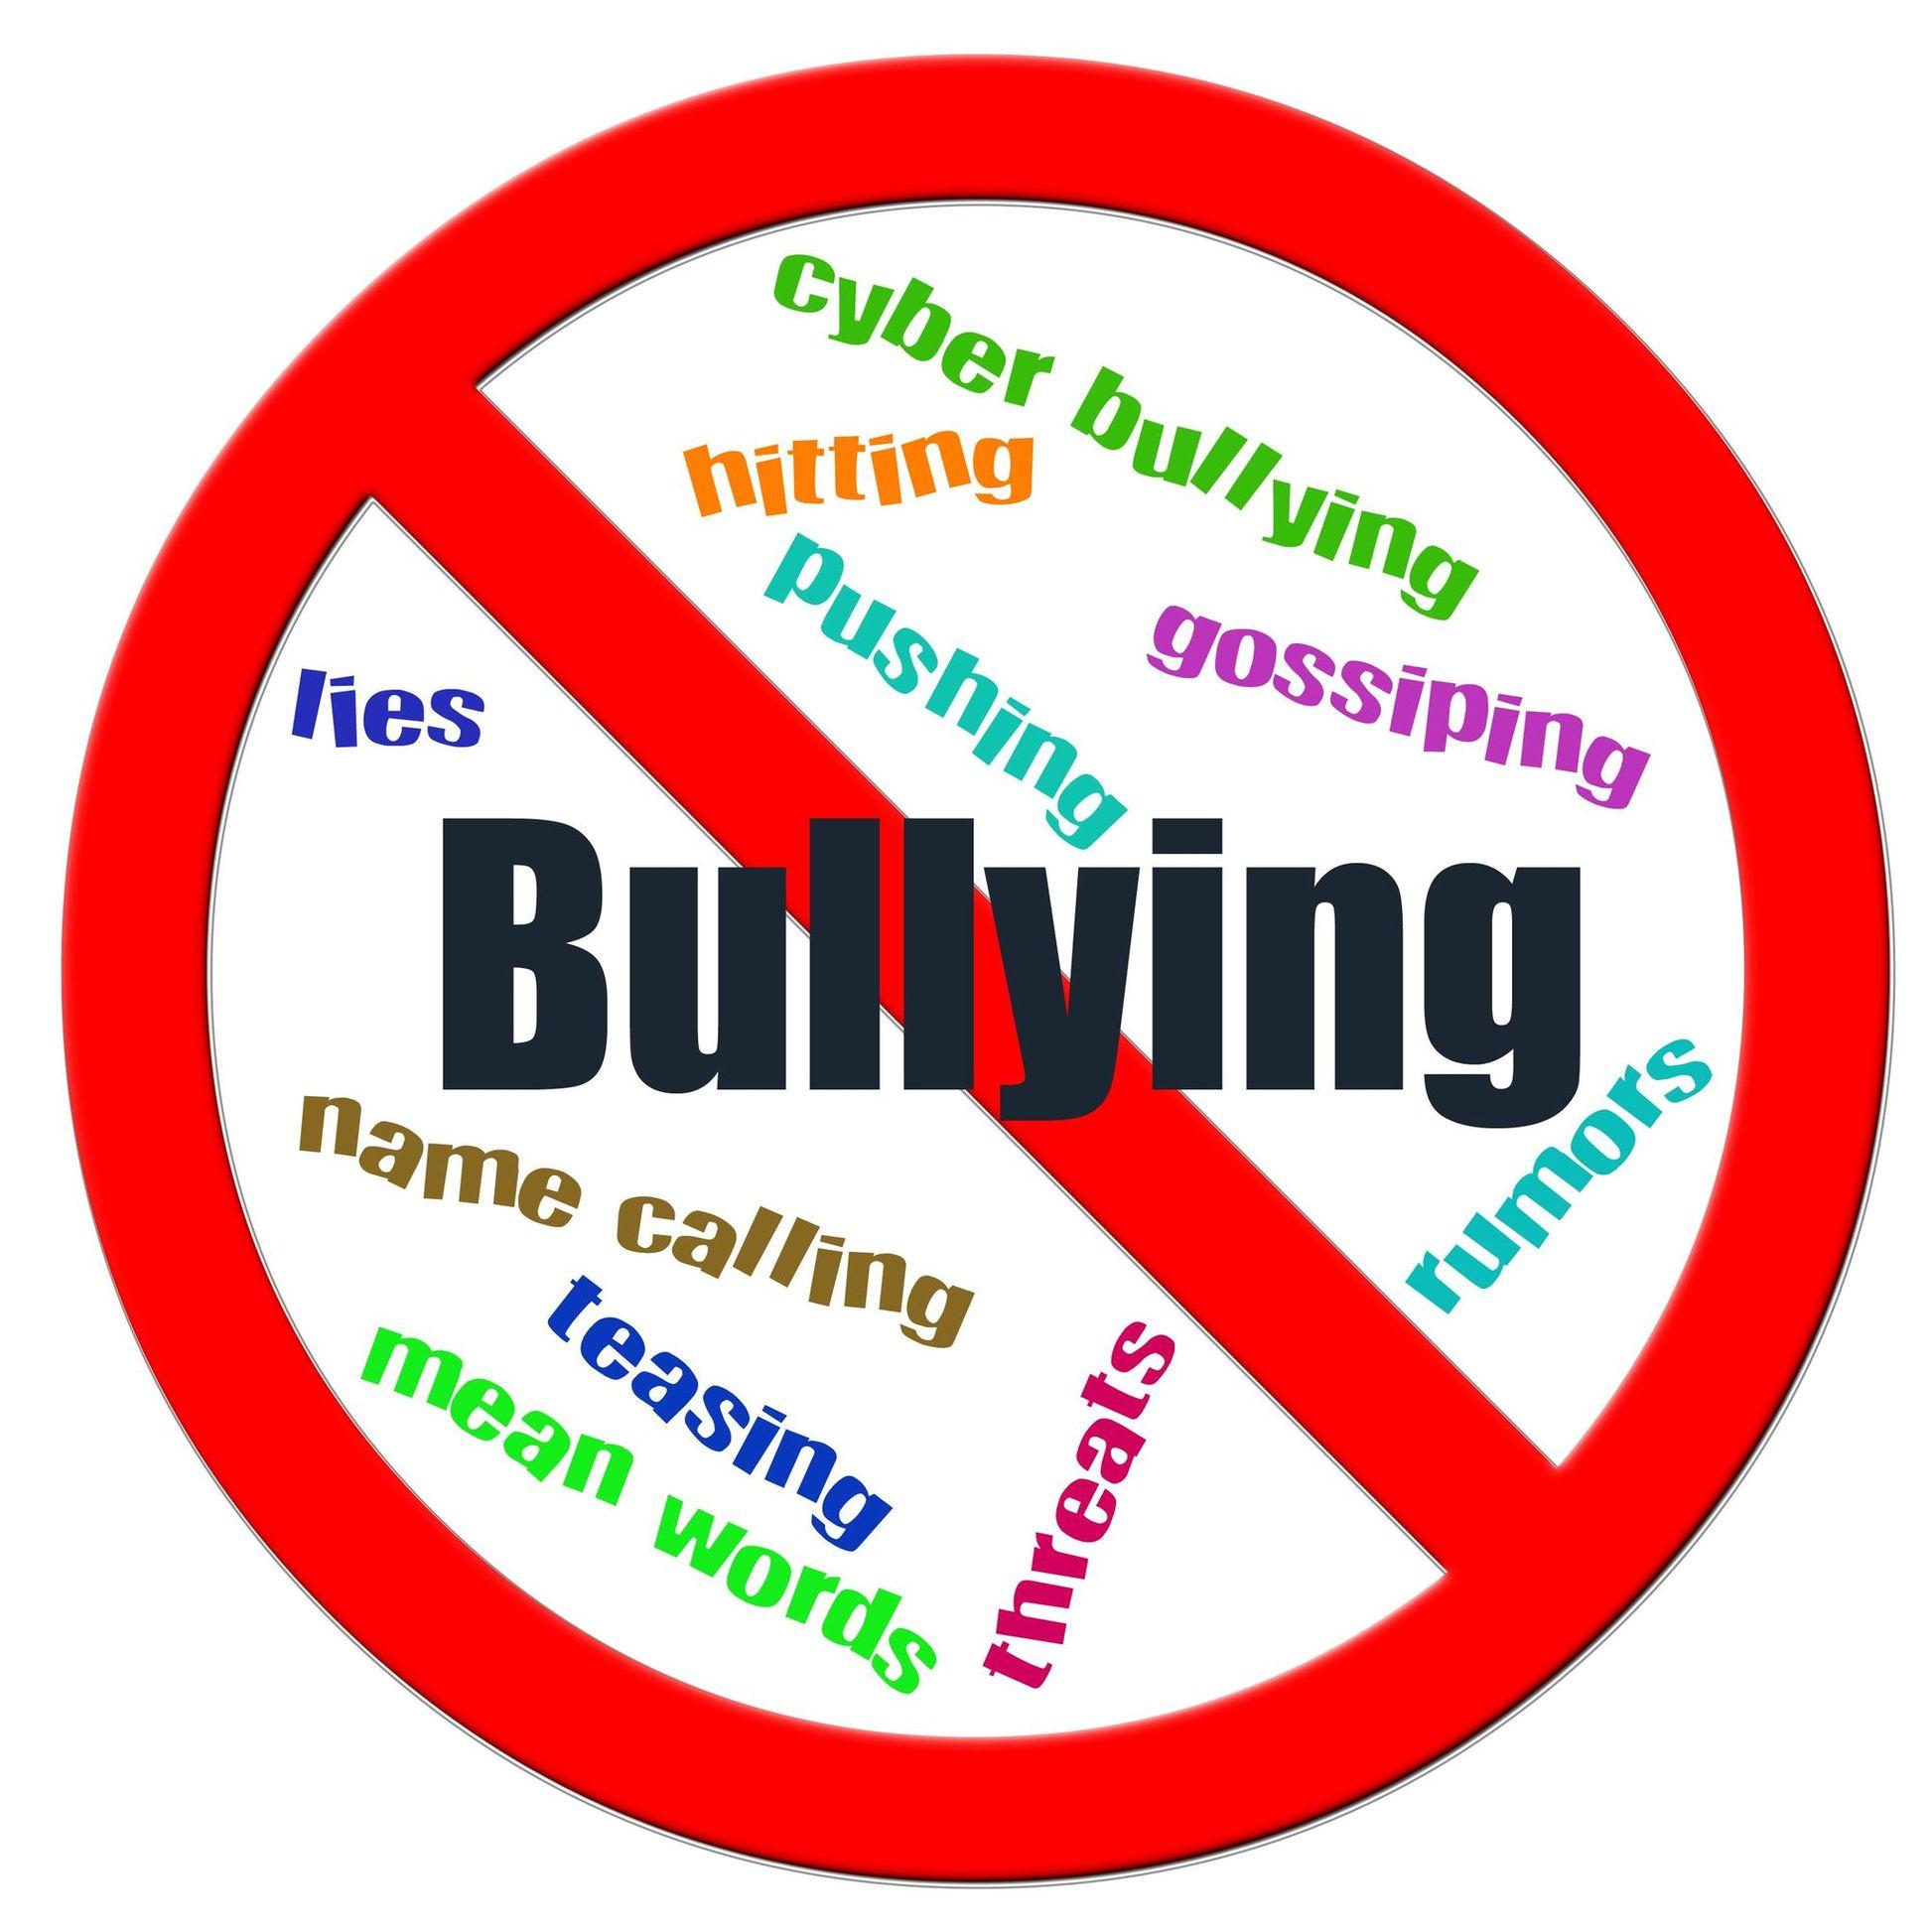 bullying jpeg.jpeg